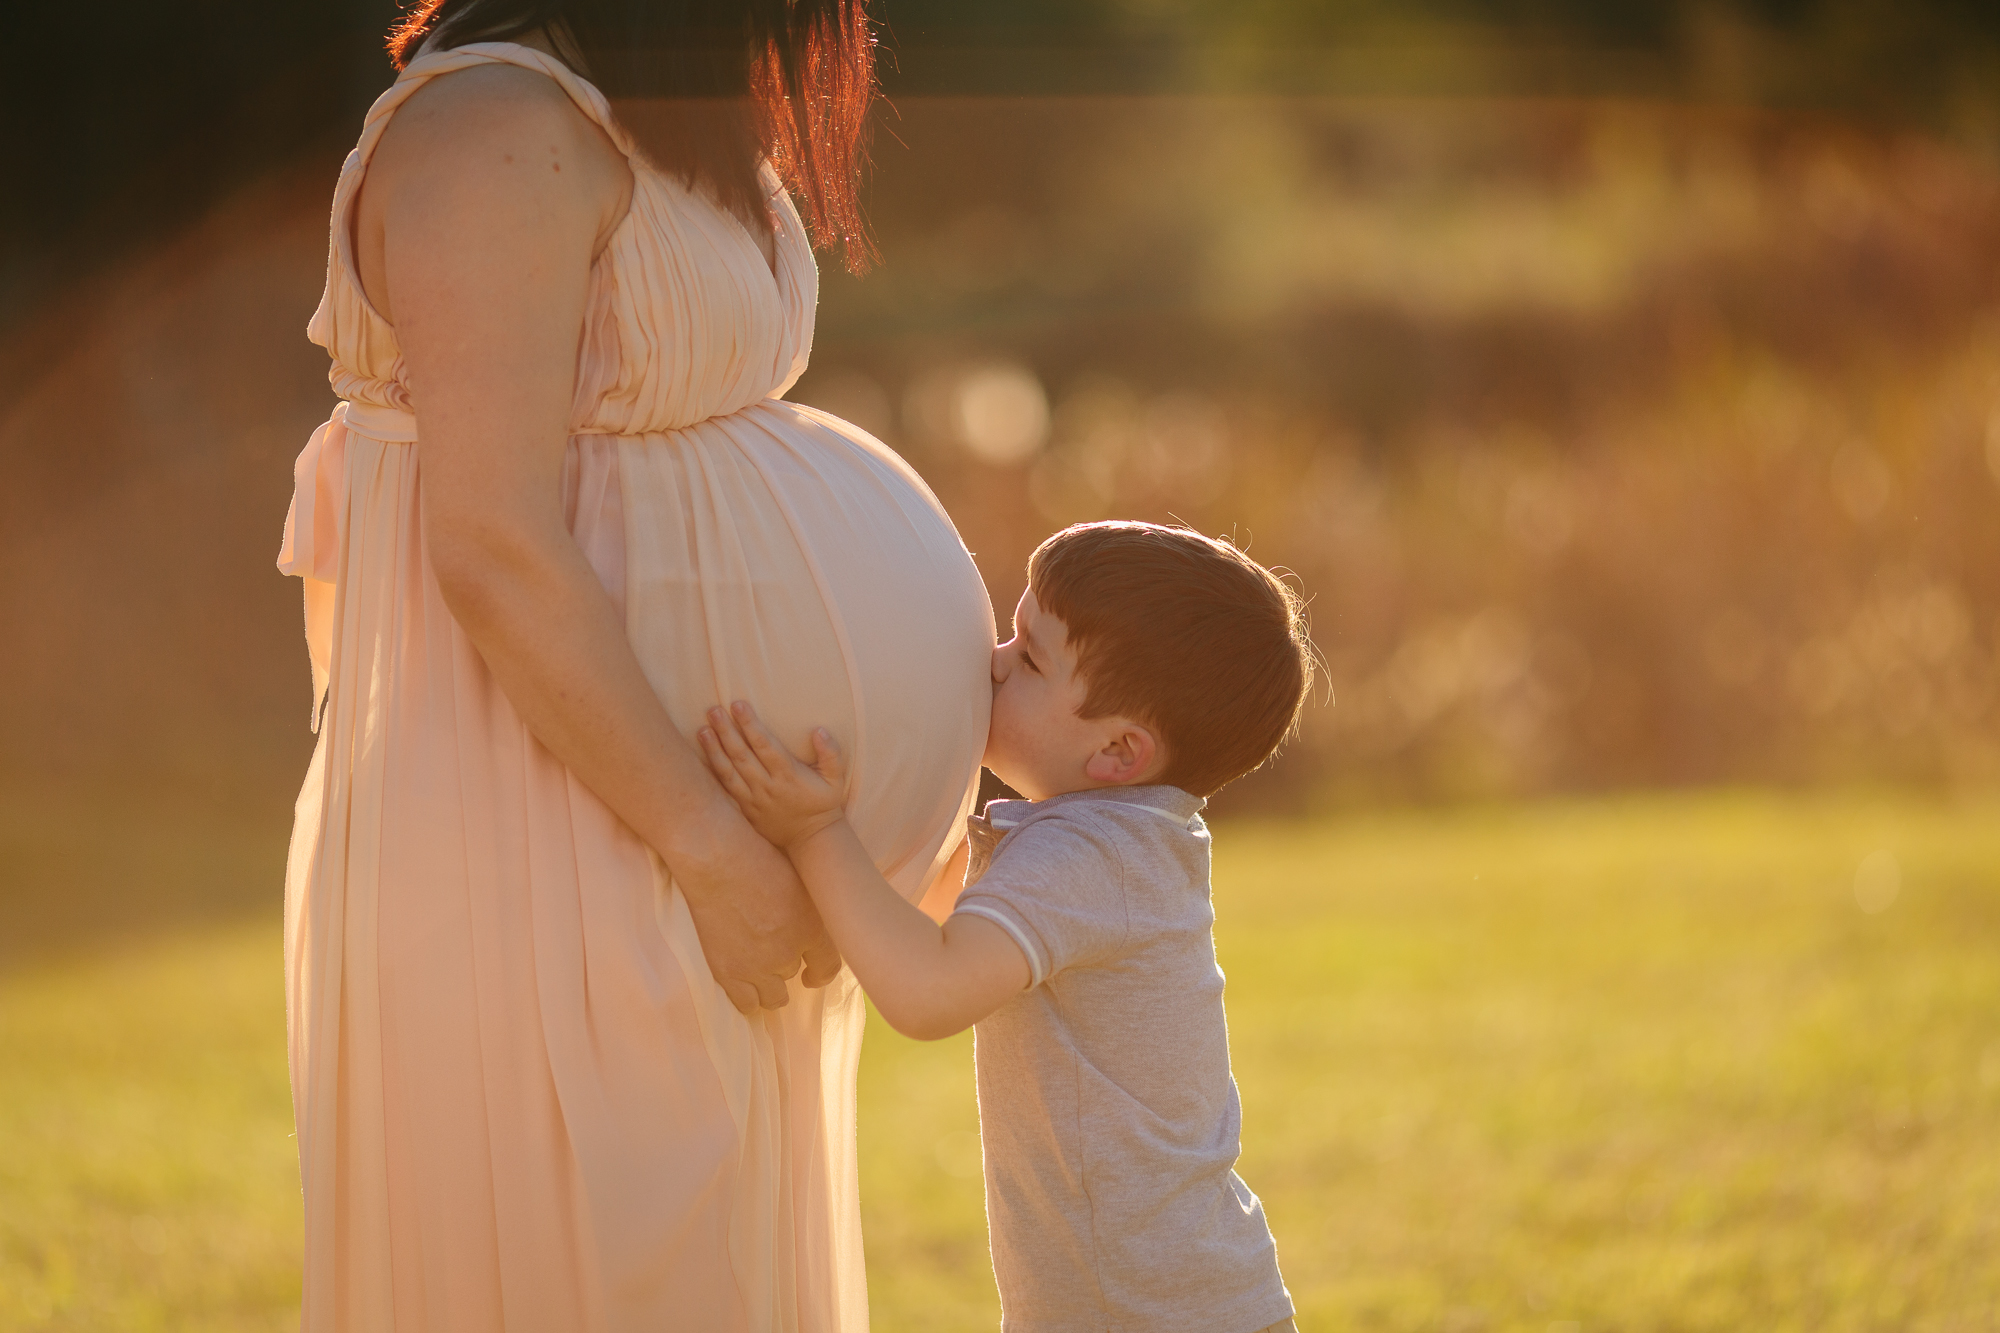 054_Maternity Lifetsyle_Shelley_Sunlight Photography.JPG